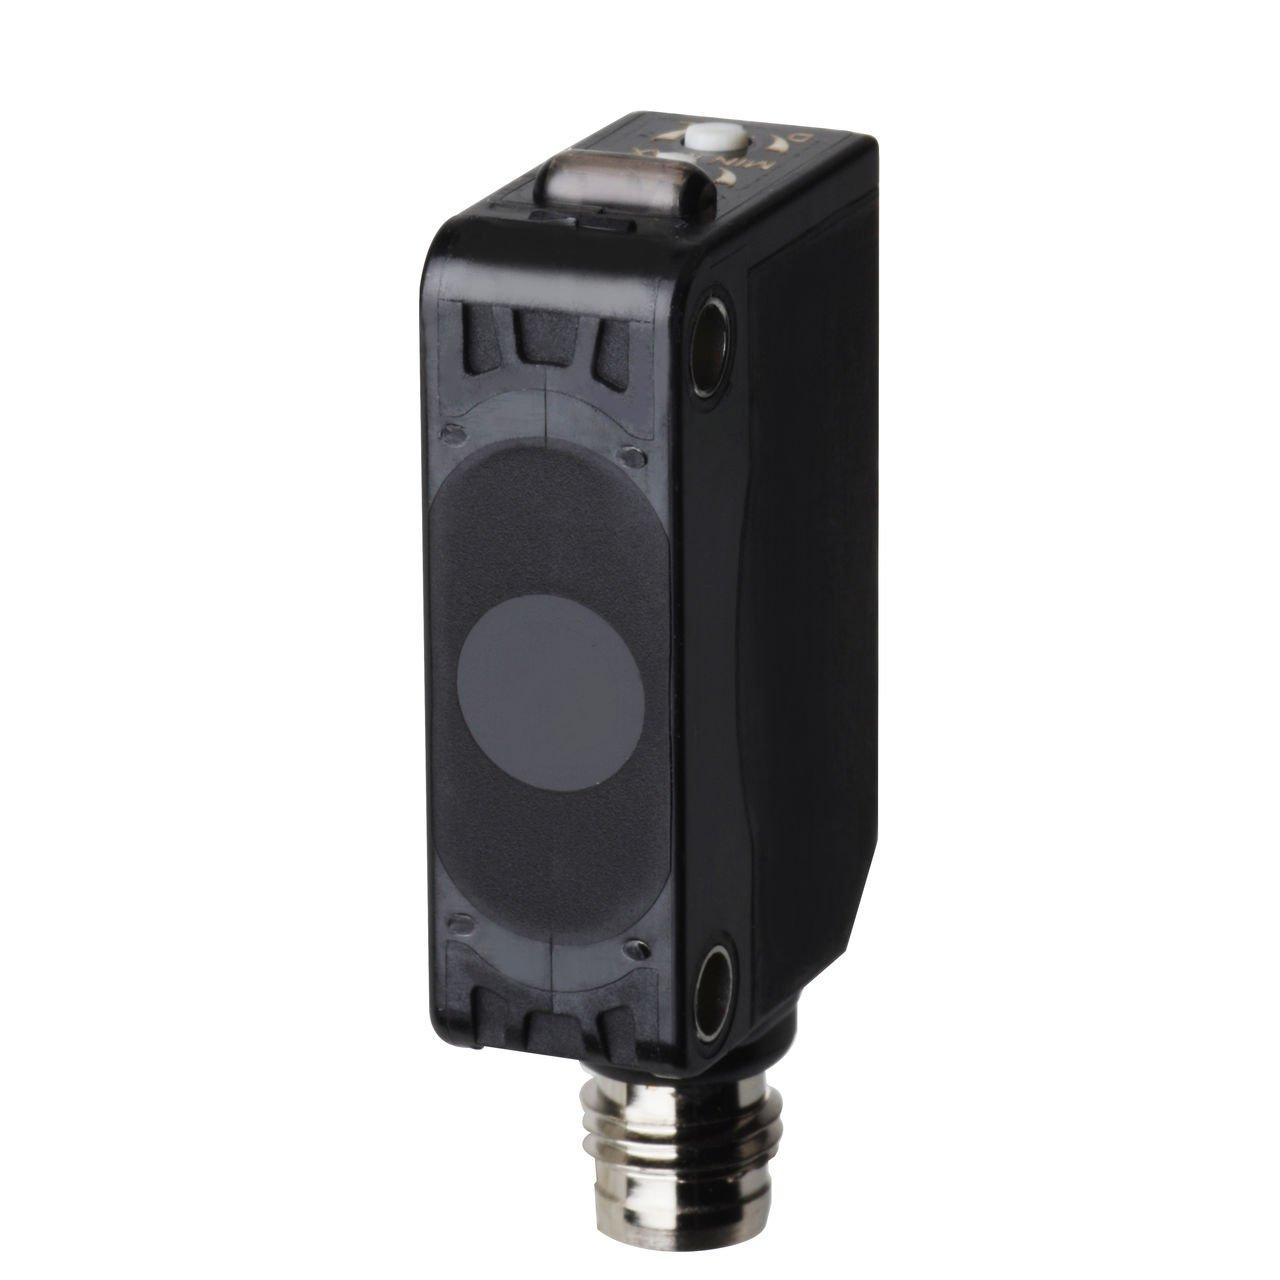 AUTONICS BJ10M-TDT-C Sensor, Photo, Through beam, 10m Sensing distance, Connector Type, Light & Dark On, NPN Output, 12-24 VDC